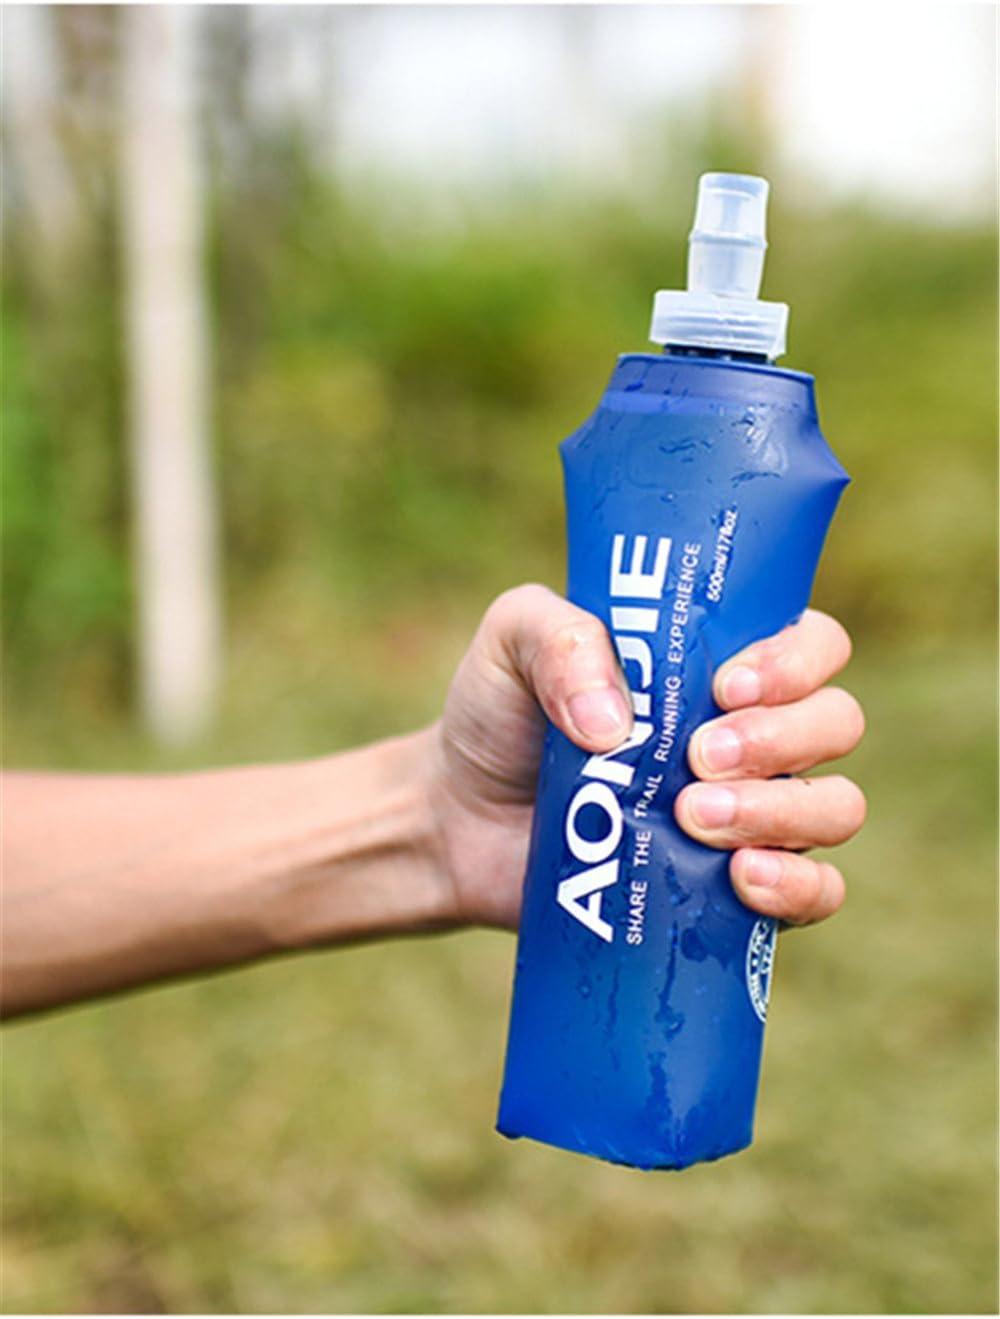 AONIJIE 2 Unidades 250 ml 500 ml Plegable Deportes BPA Libre de PVC Botella Plegable para Deporte Flask Botella de Hidrataci/ón